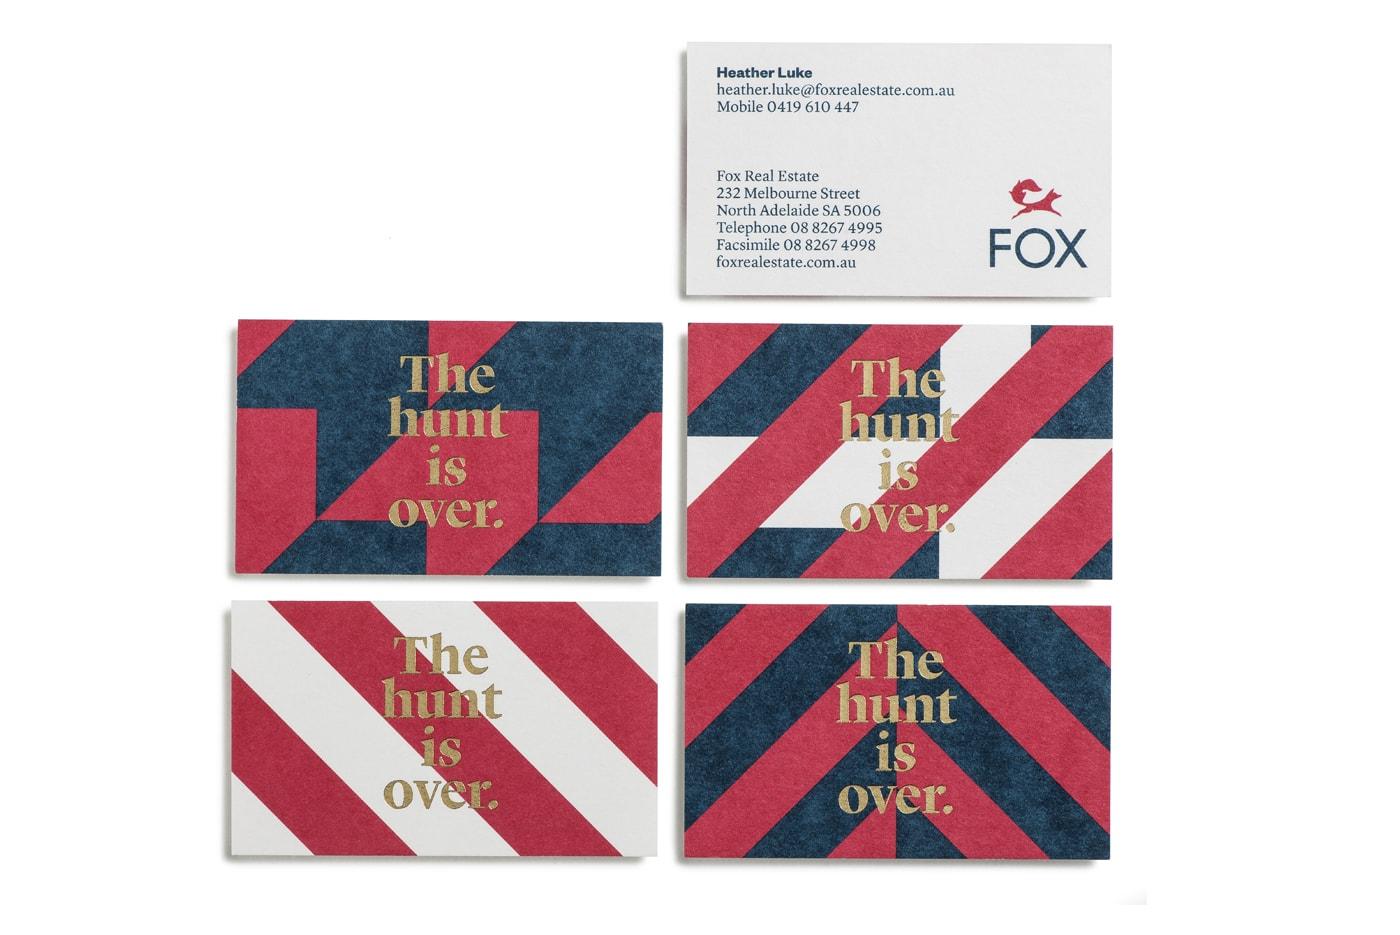 fox-real-estate-realtor-business-card